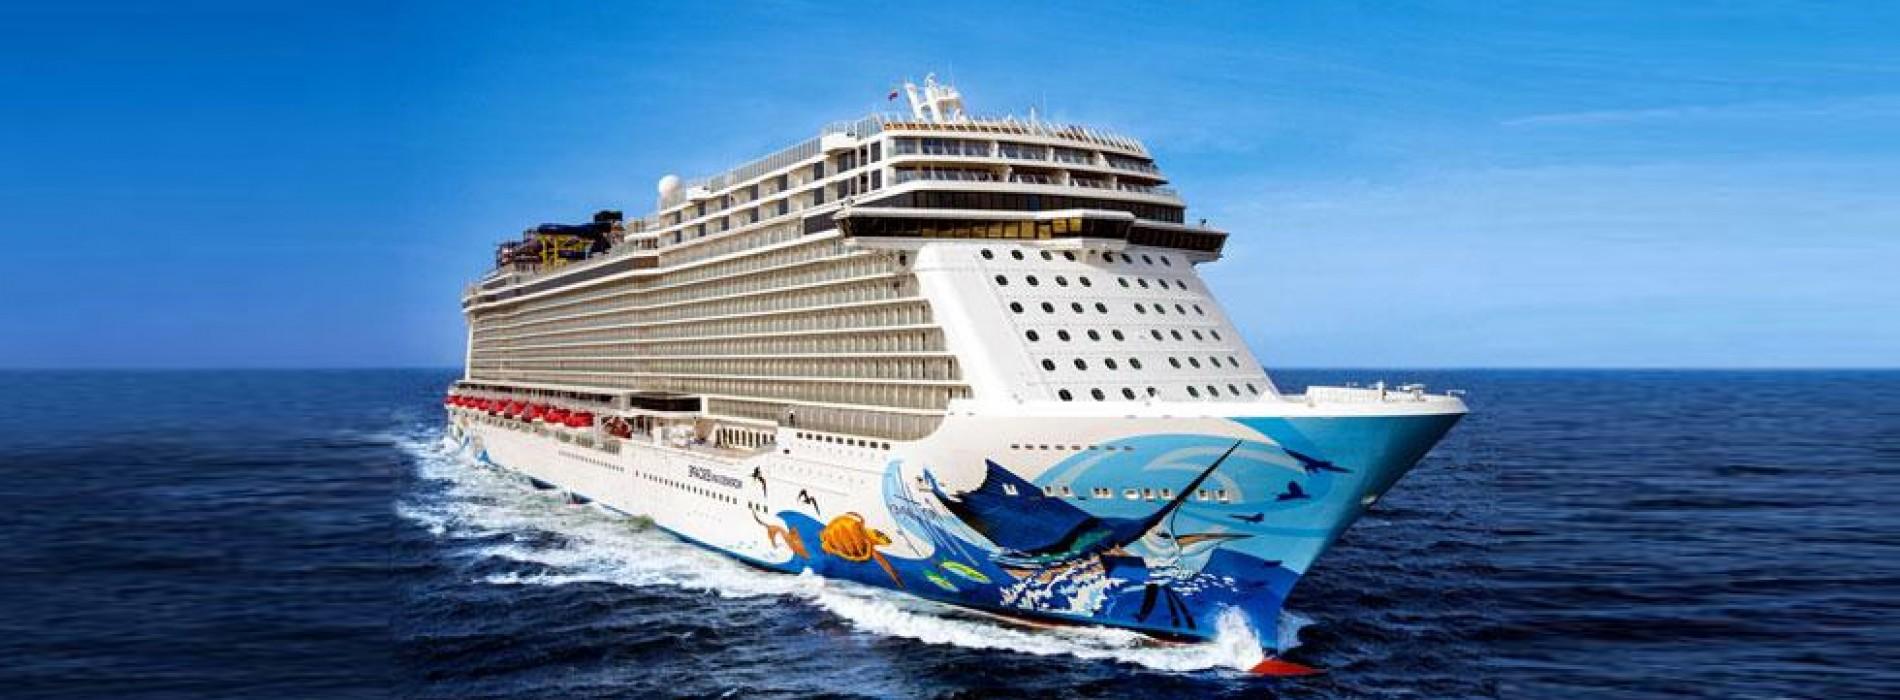 Largest Asian cruise ship starts maiden voyage